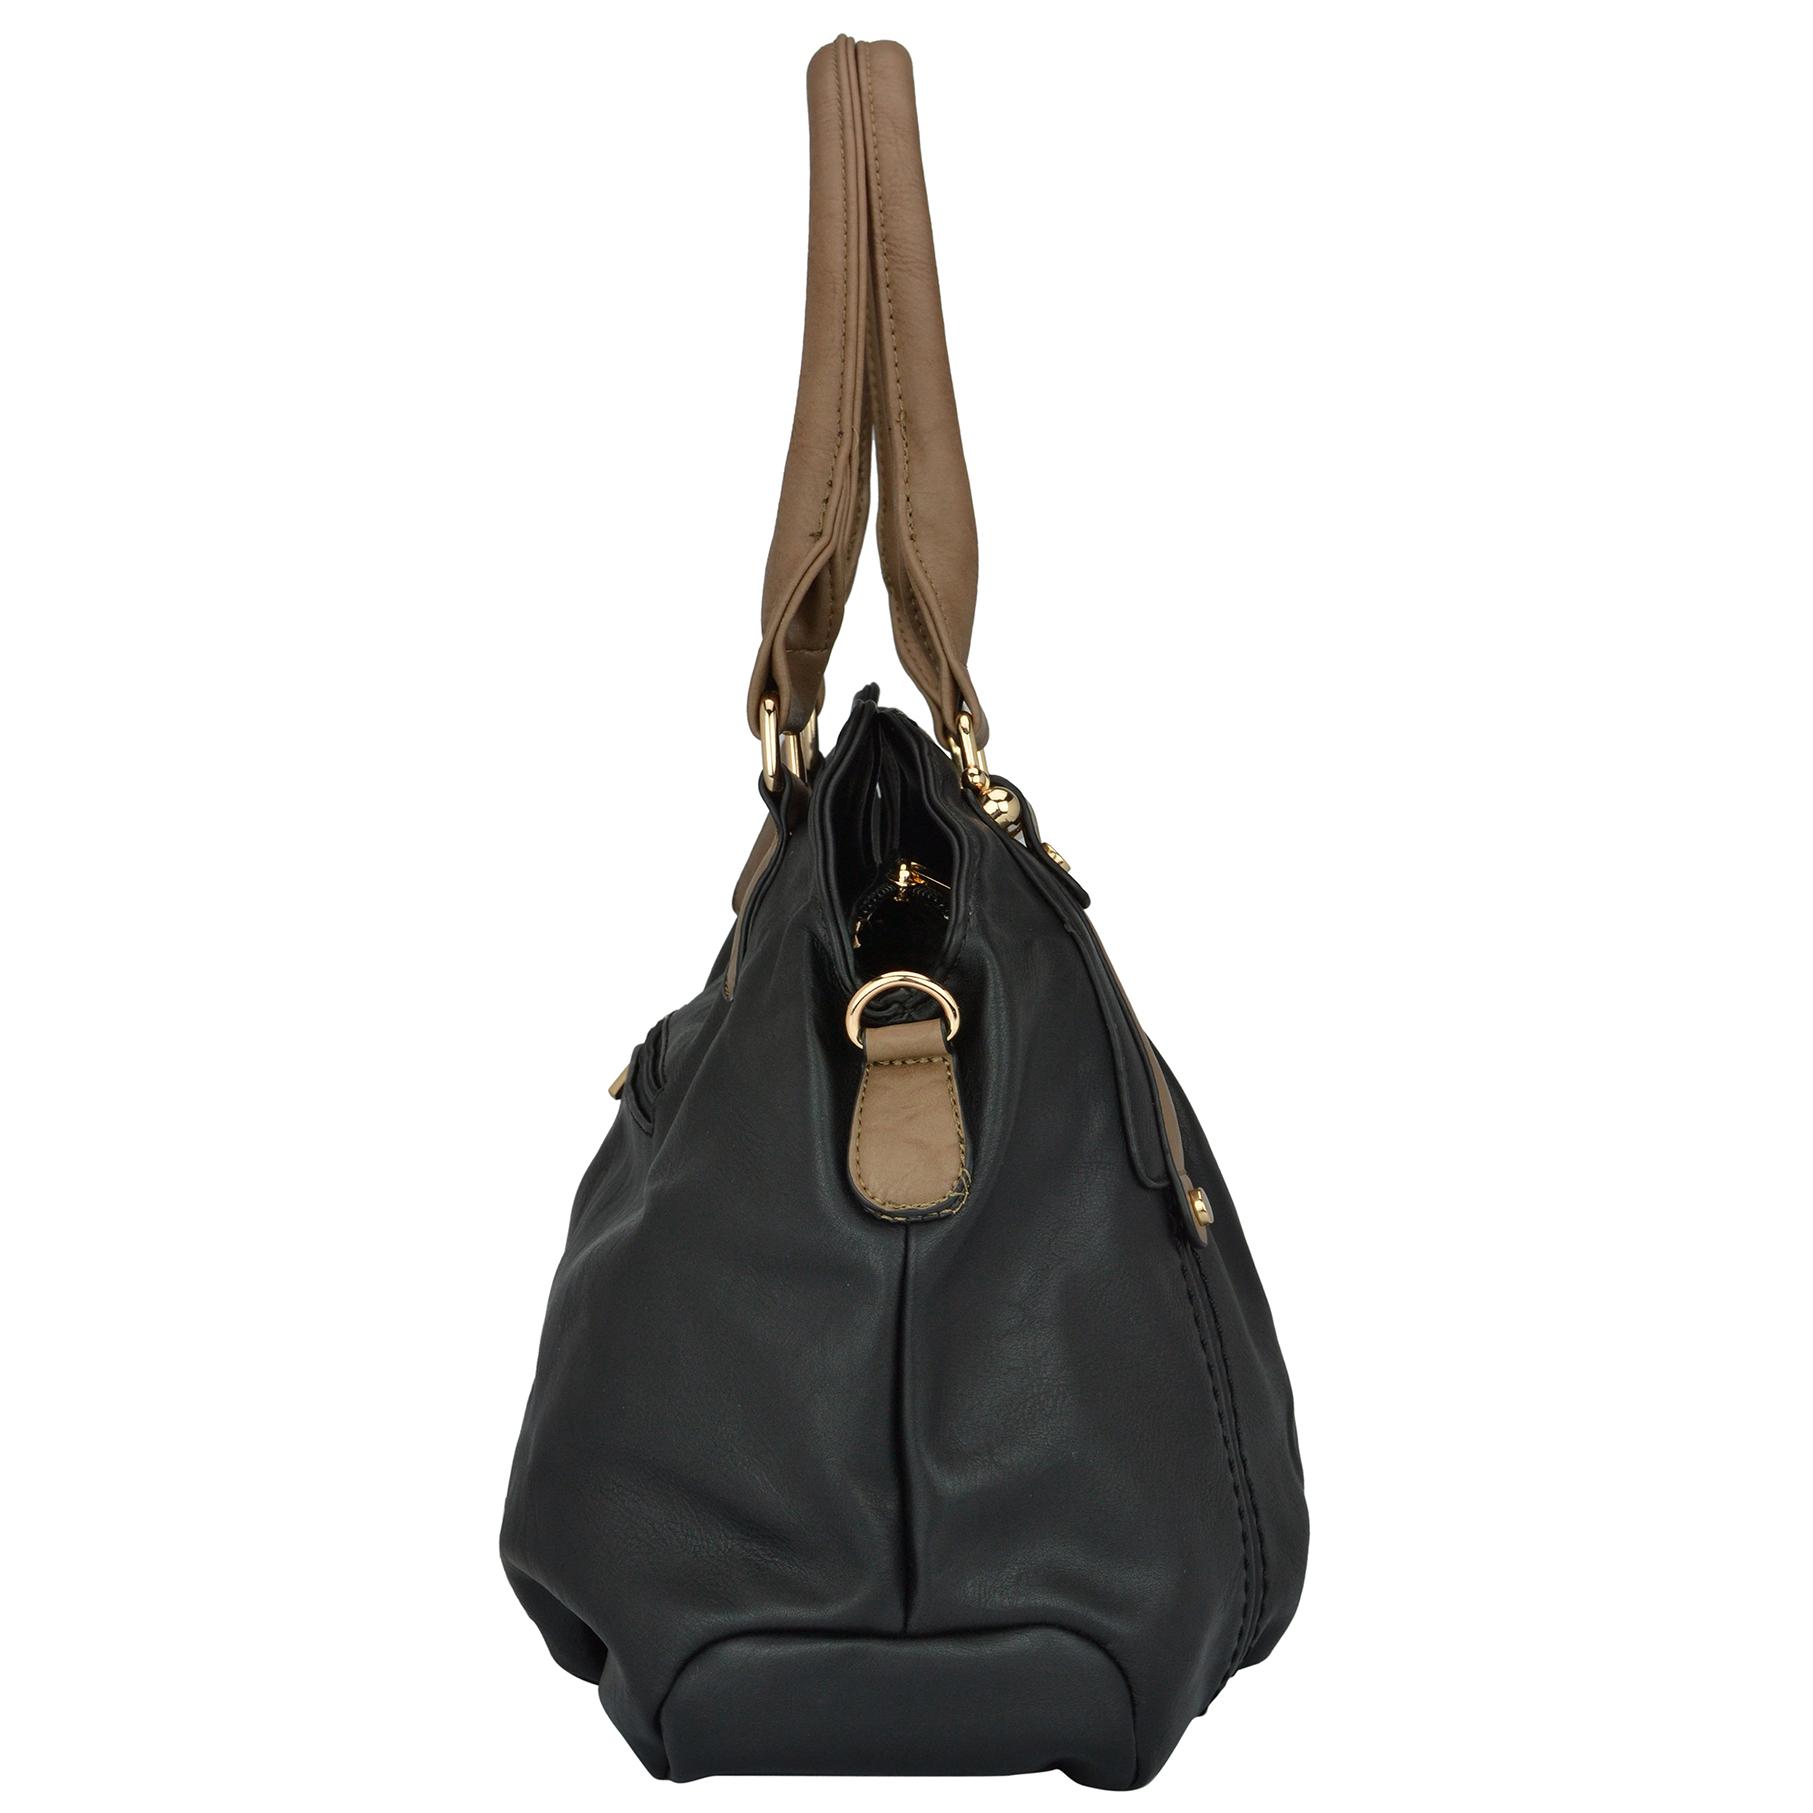 mg-collection-mimi-office-tote-style-handbag-jsh-yd-1225bk-3.jpg